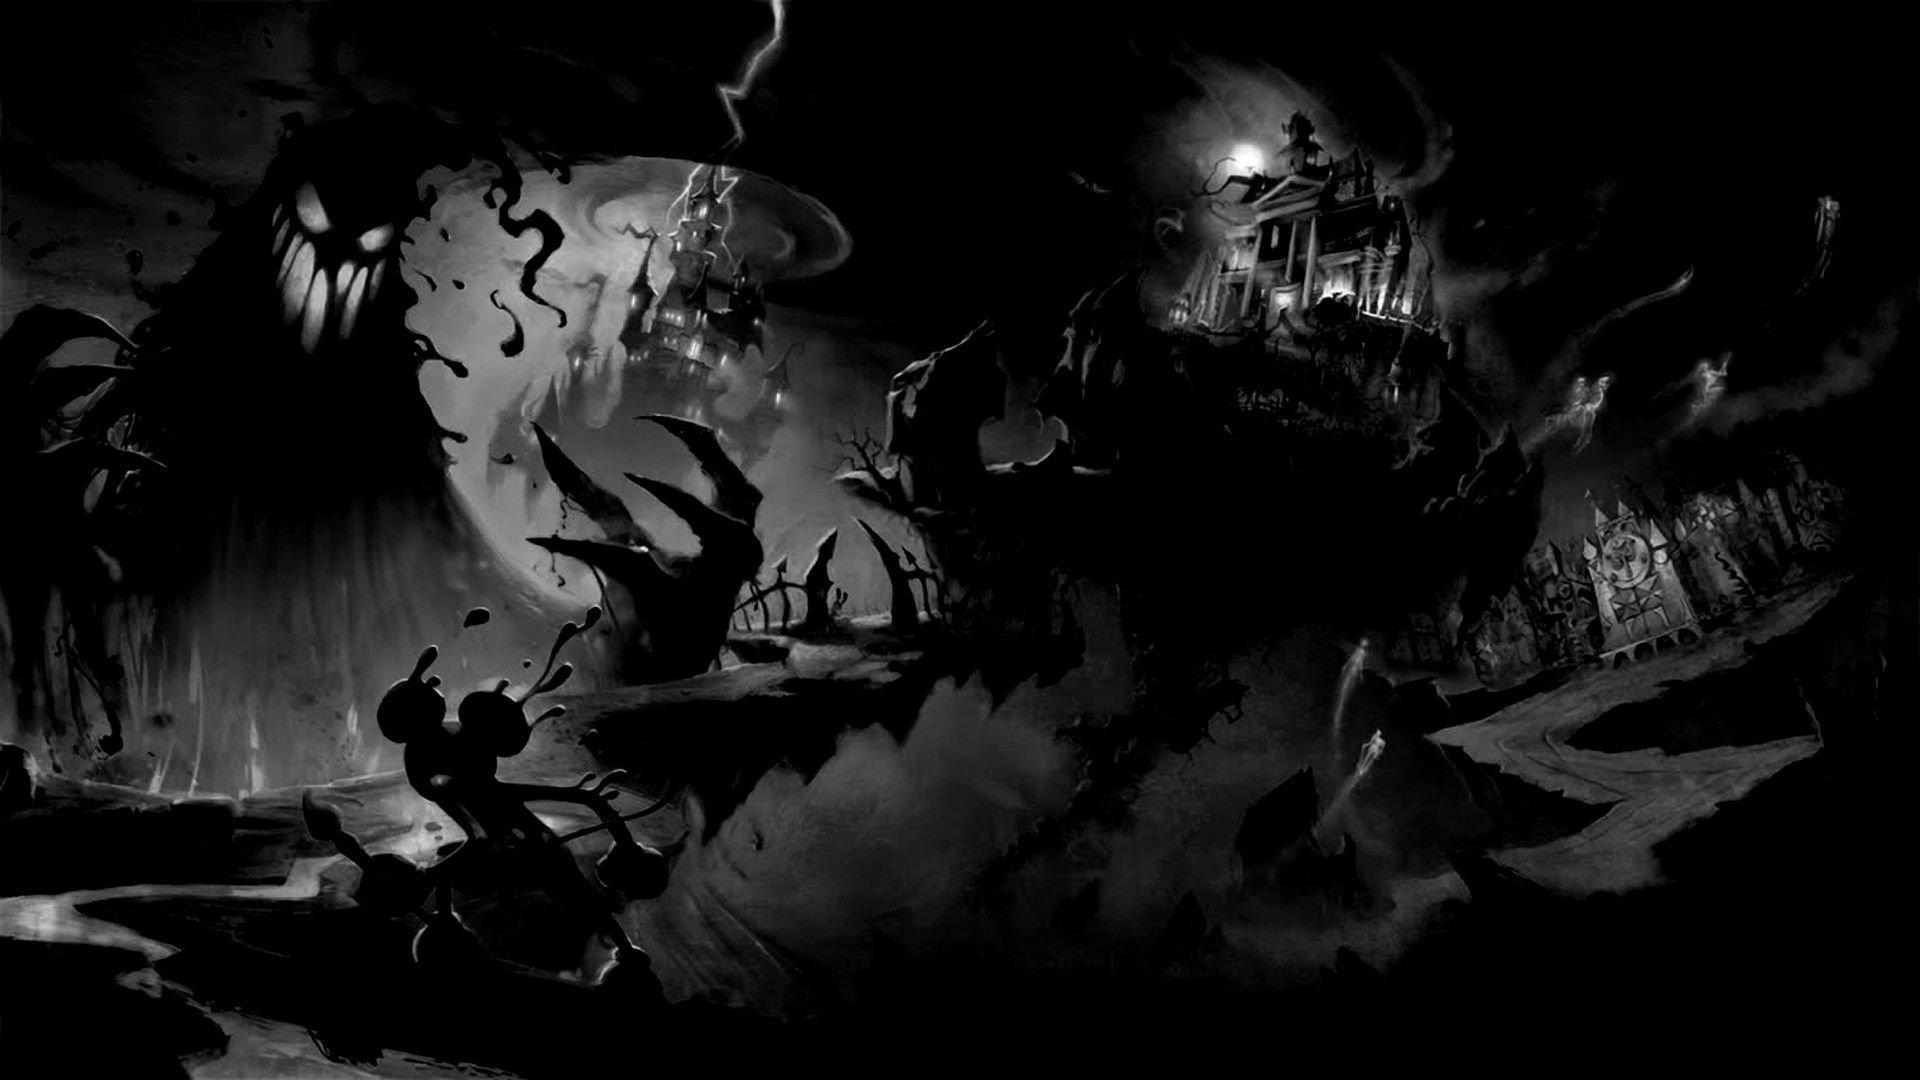 Disney mickey mouse horror halloween haunted wallpaper 1920x1080 1920x1080